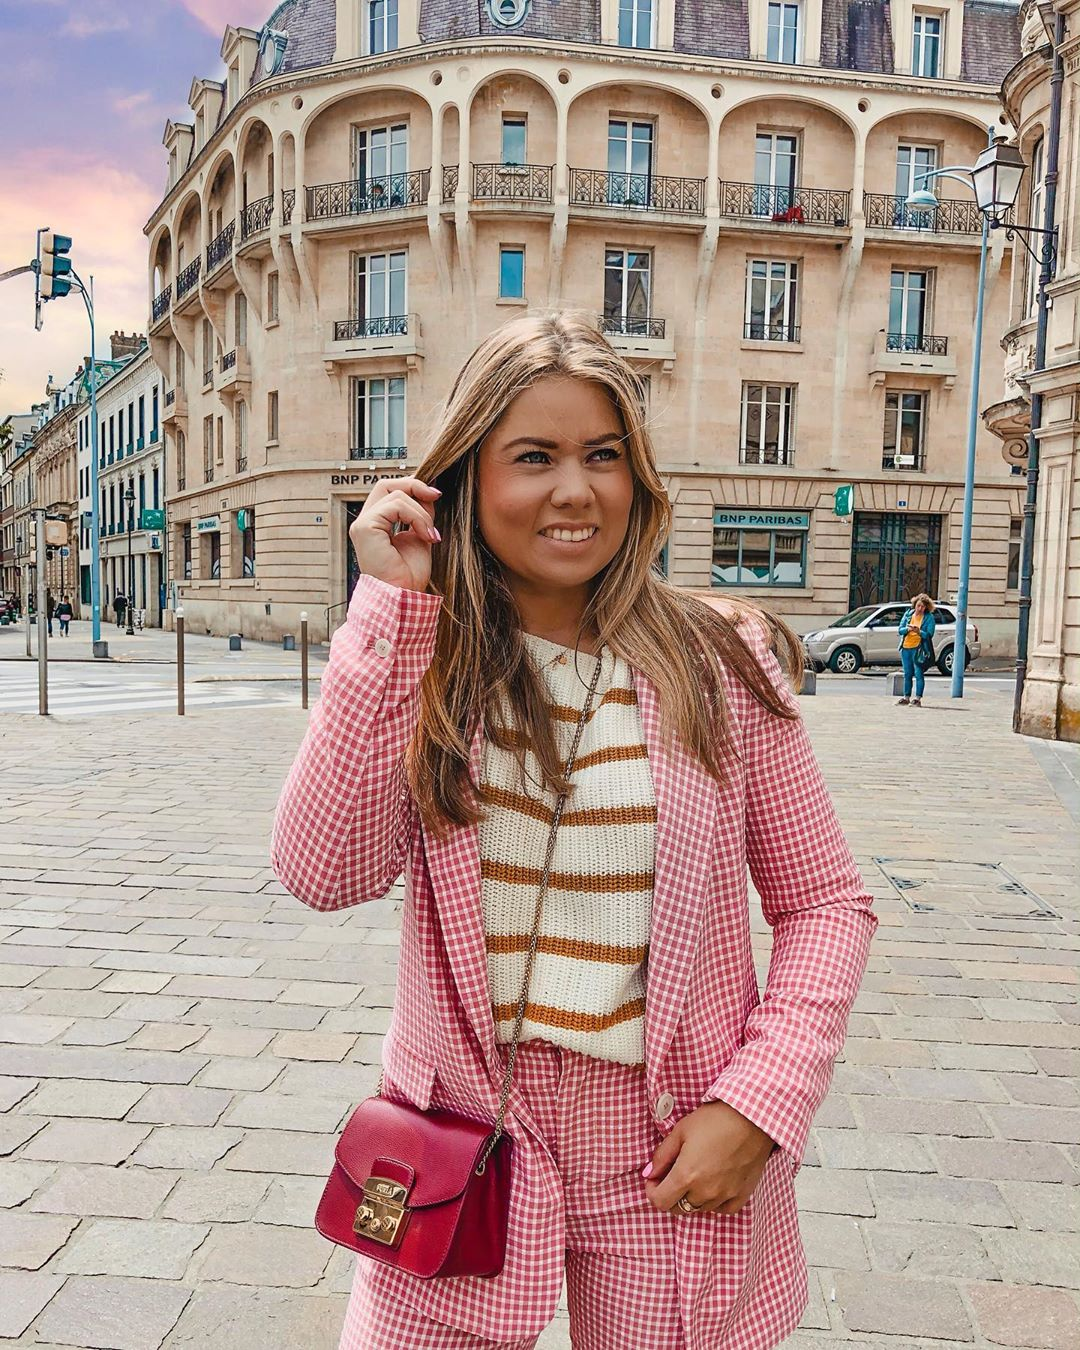 gingham plaid jacket de Zara sur nikitaloohuis